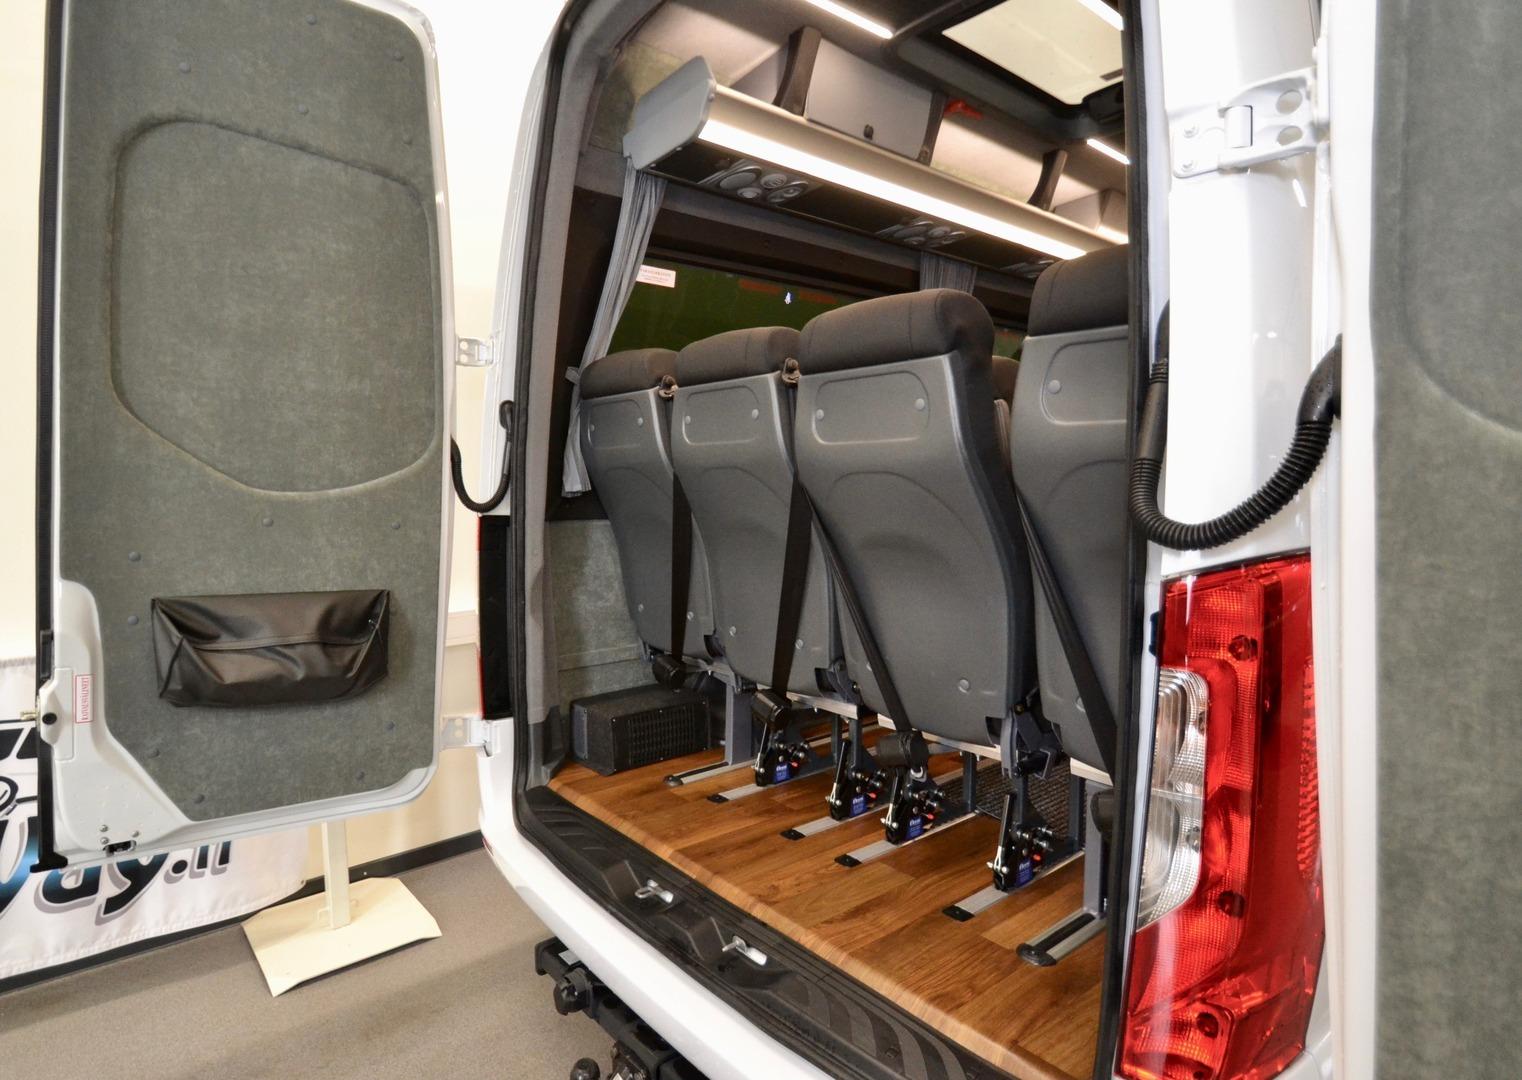 MERCEDES-BENZ Sprinter, 316 CDI Automet AW Edition